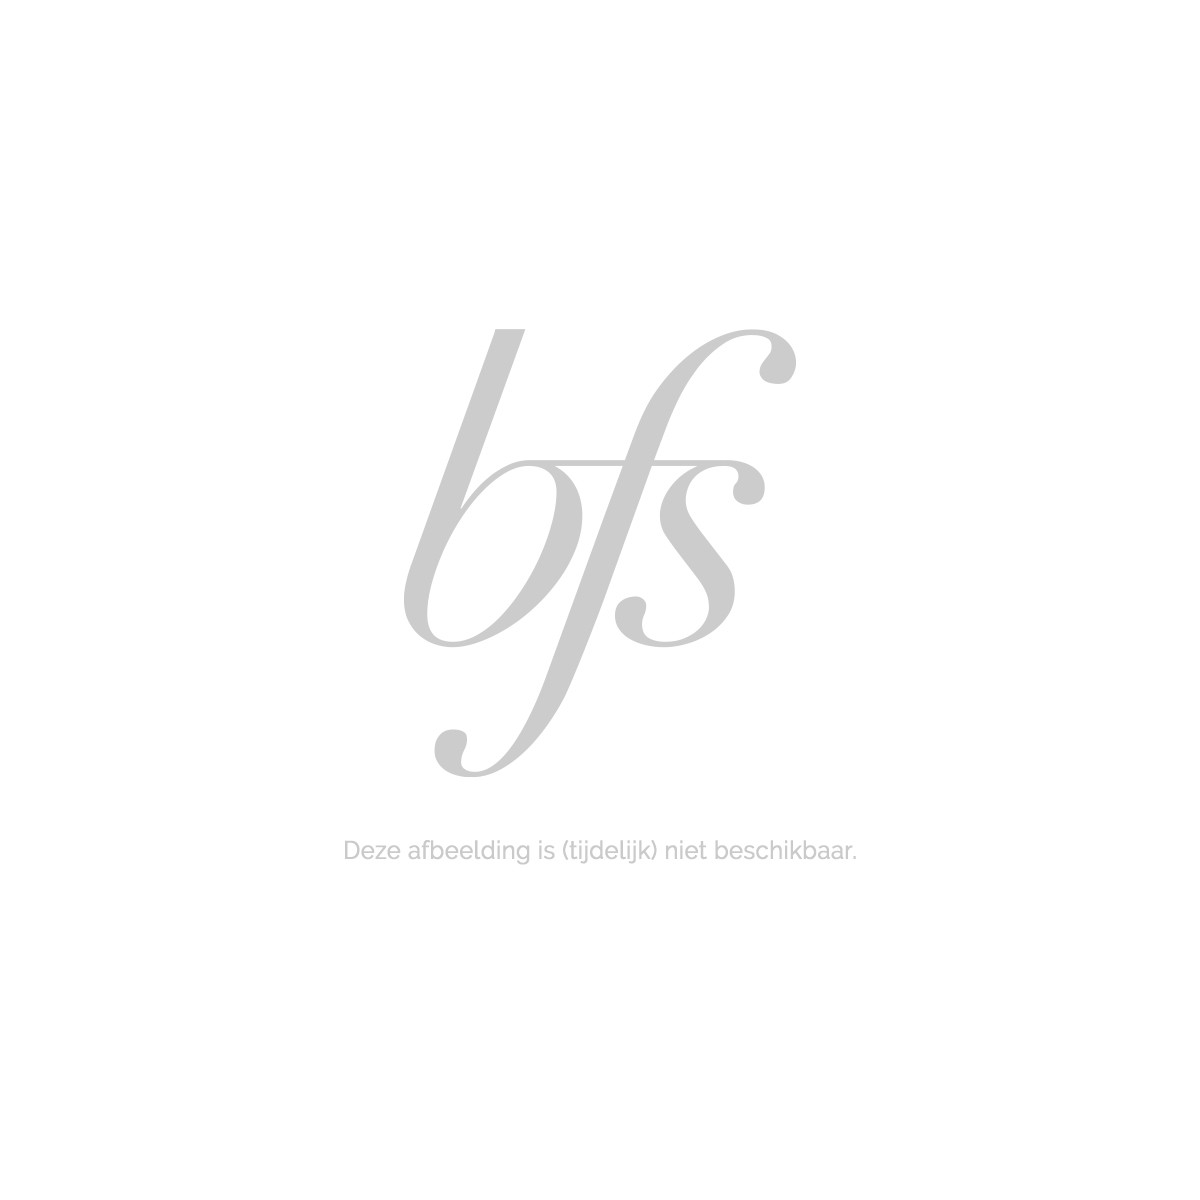 Balm Balm Single Note Eau De Parfum Gift Set